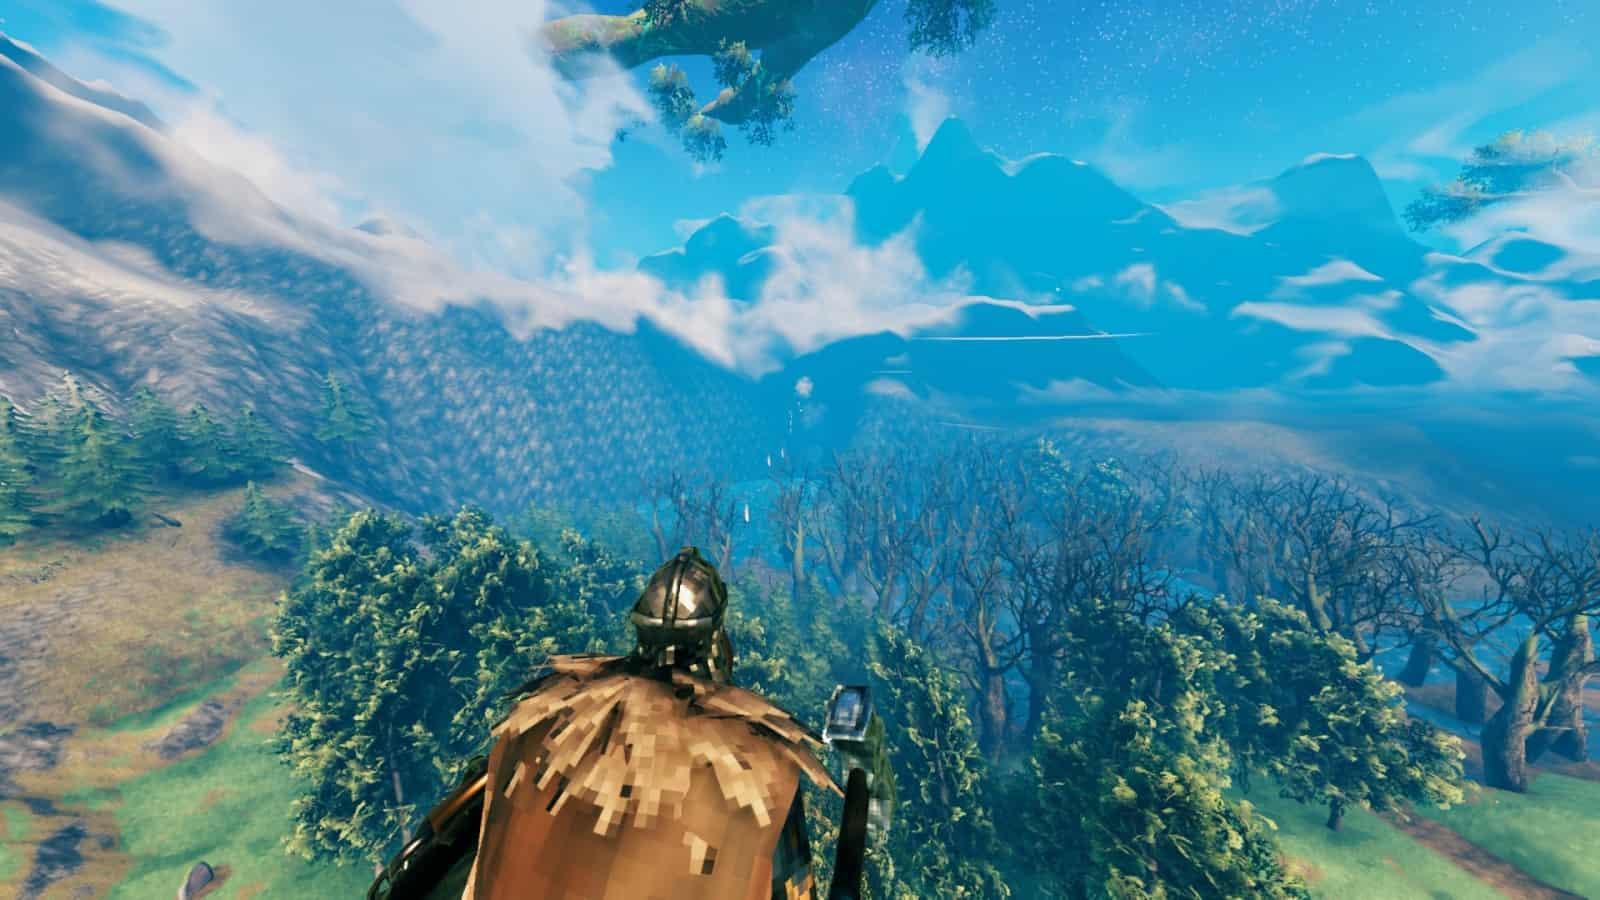 Northrend Recreated In Playable Valheim Mod 2